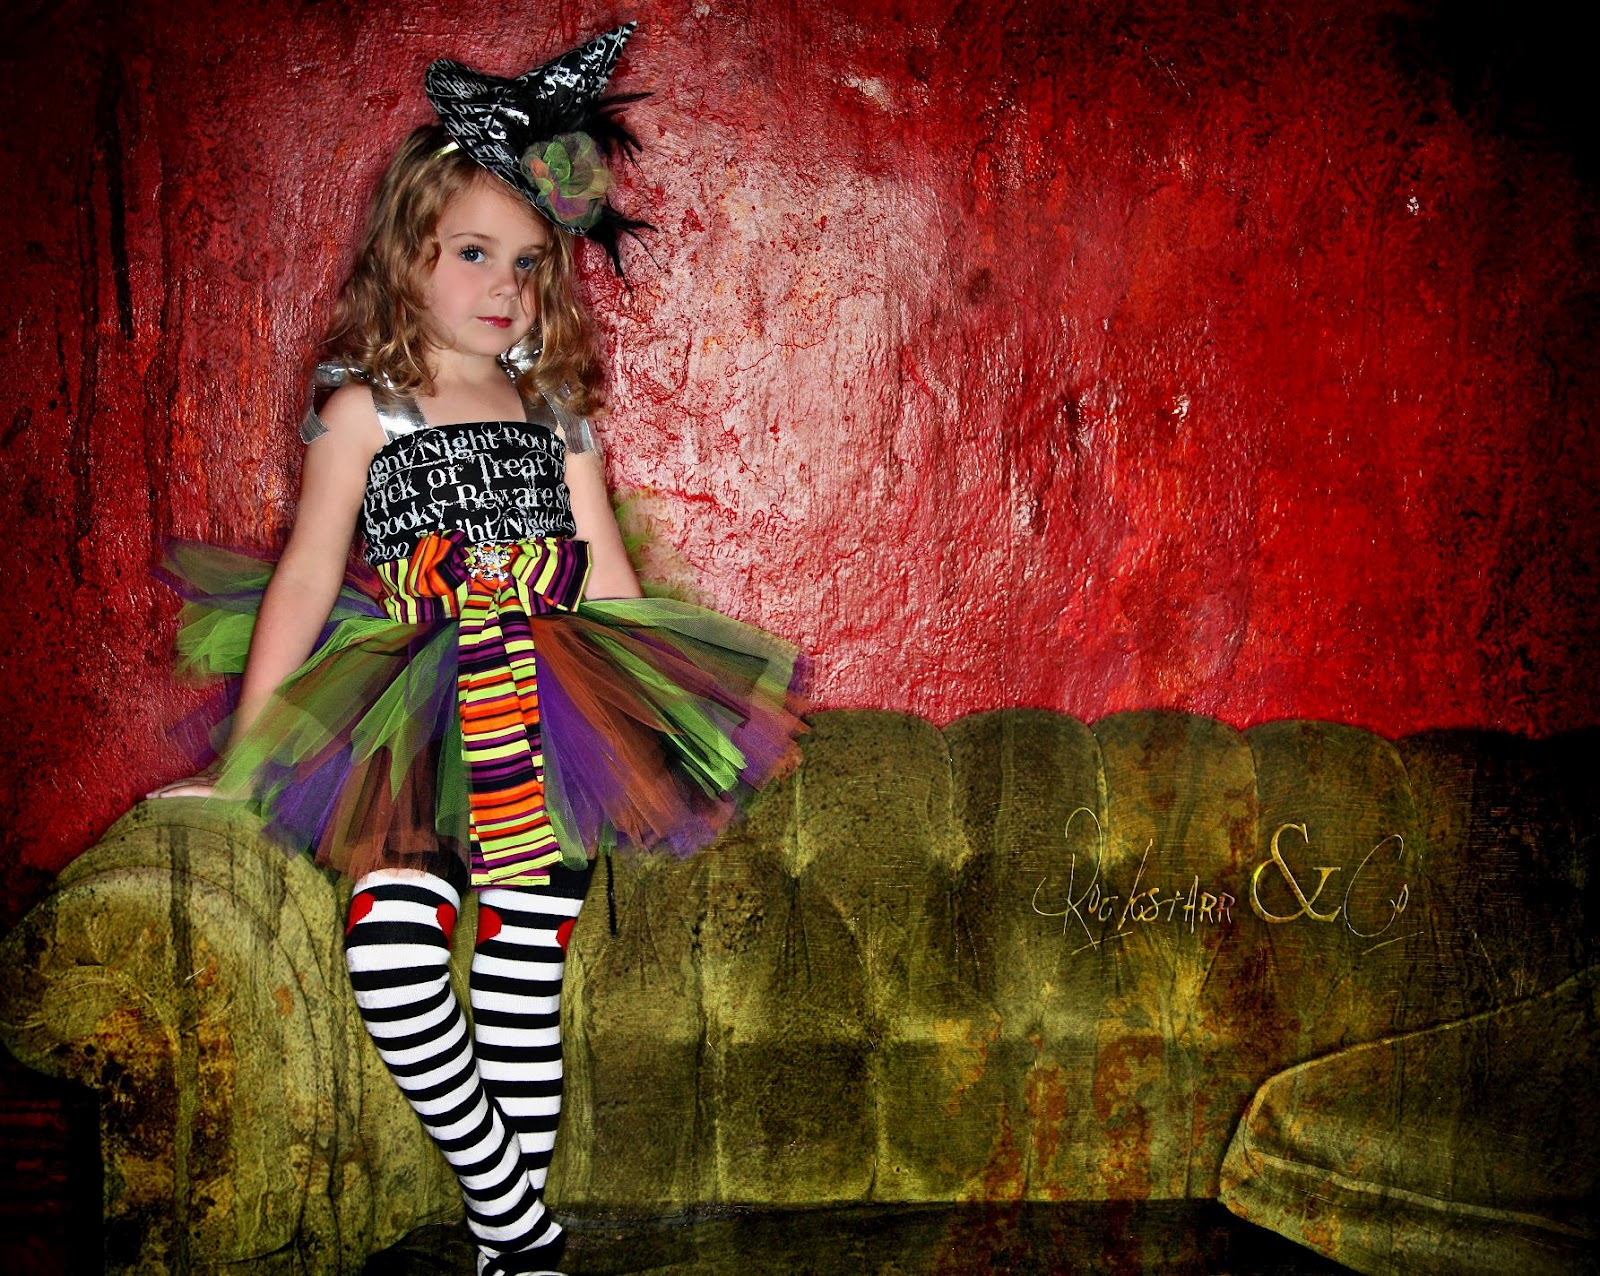 sc 1 st  Abbyu0027s TuTu Factory & Halloween Costume line by Abbyu0027s TuTu Factory a huge success!